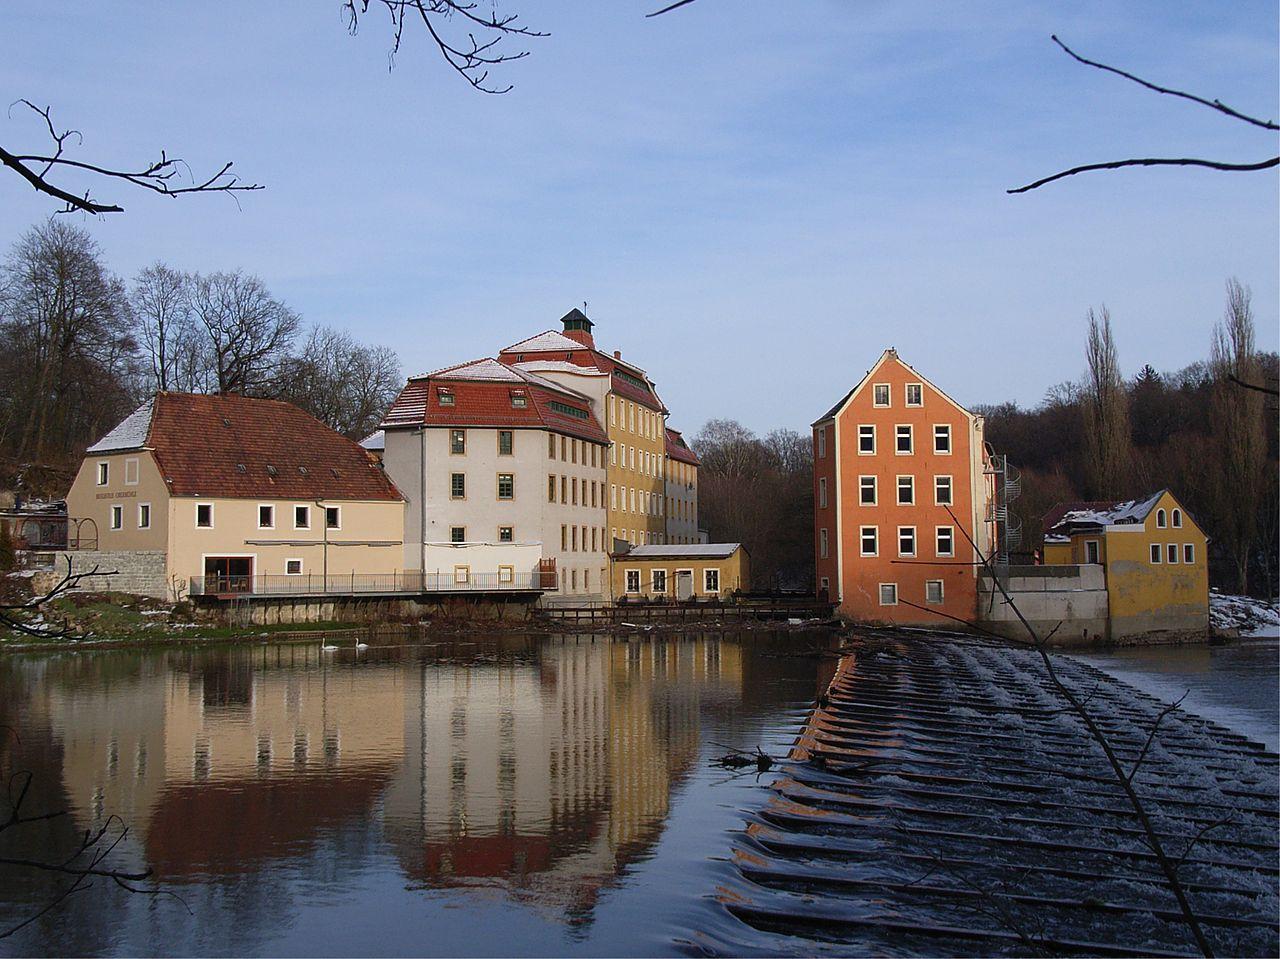 Bild Brauhaus Obermühle Görlitz